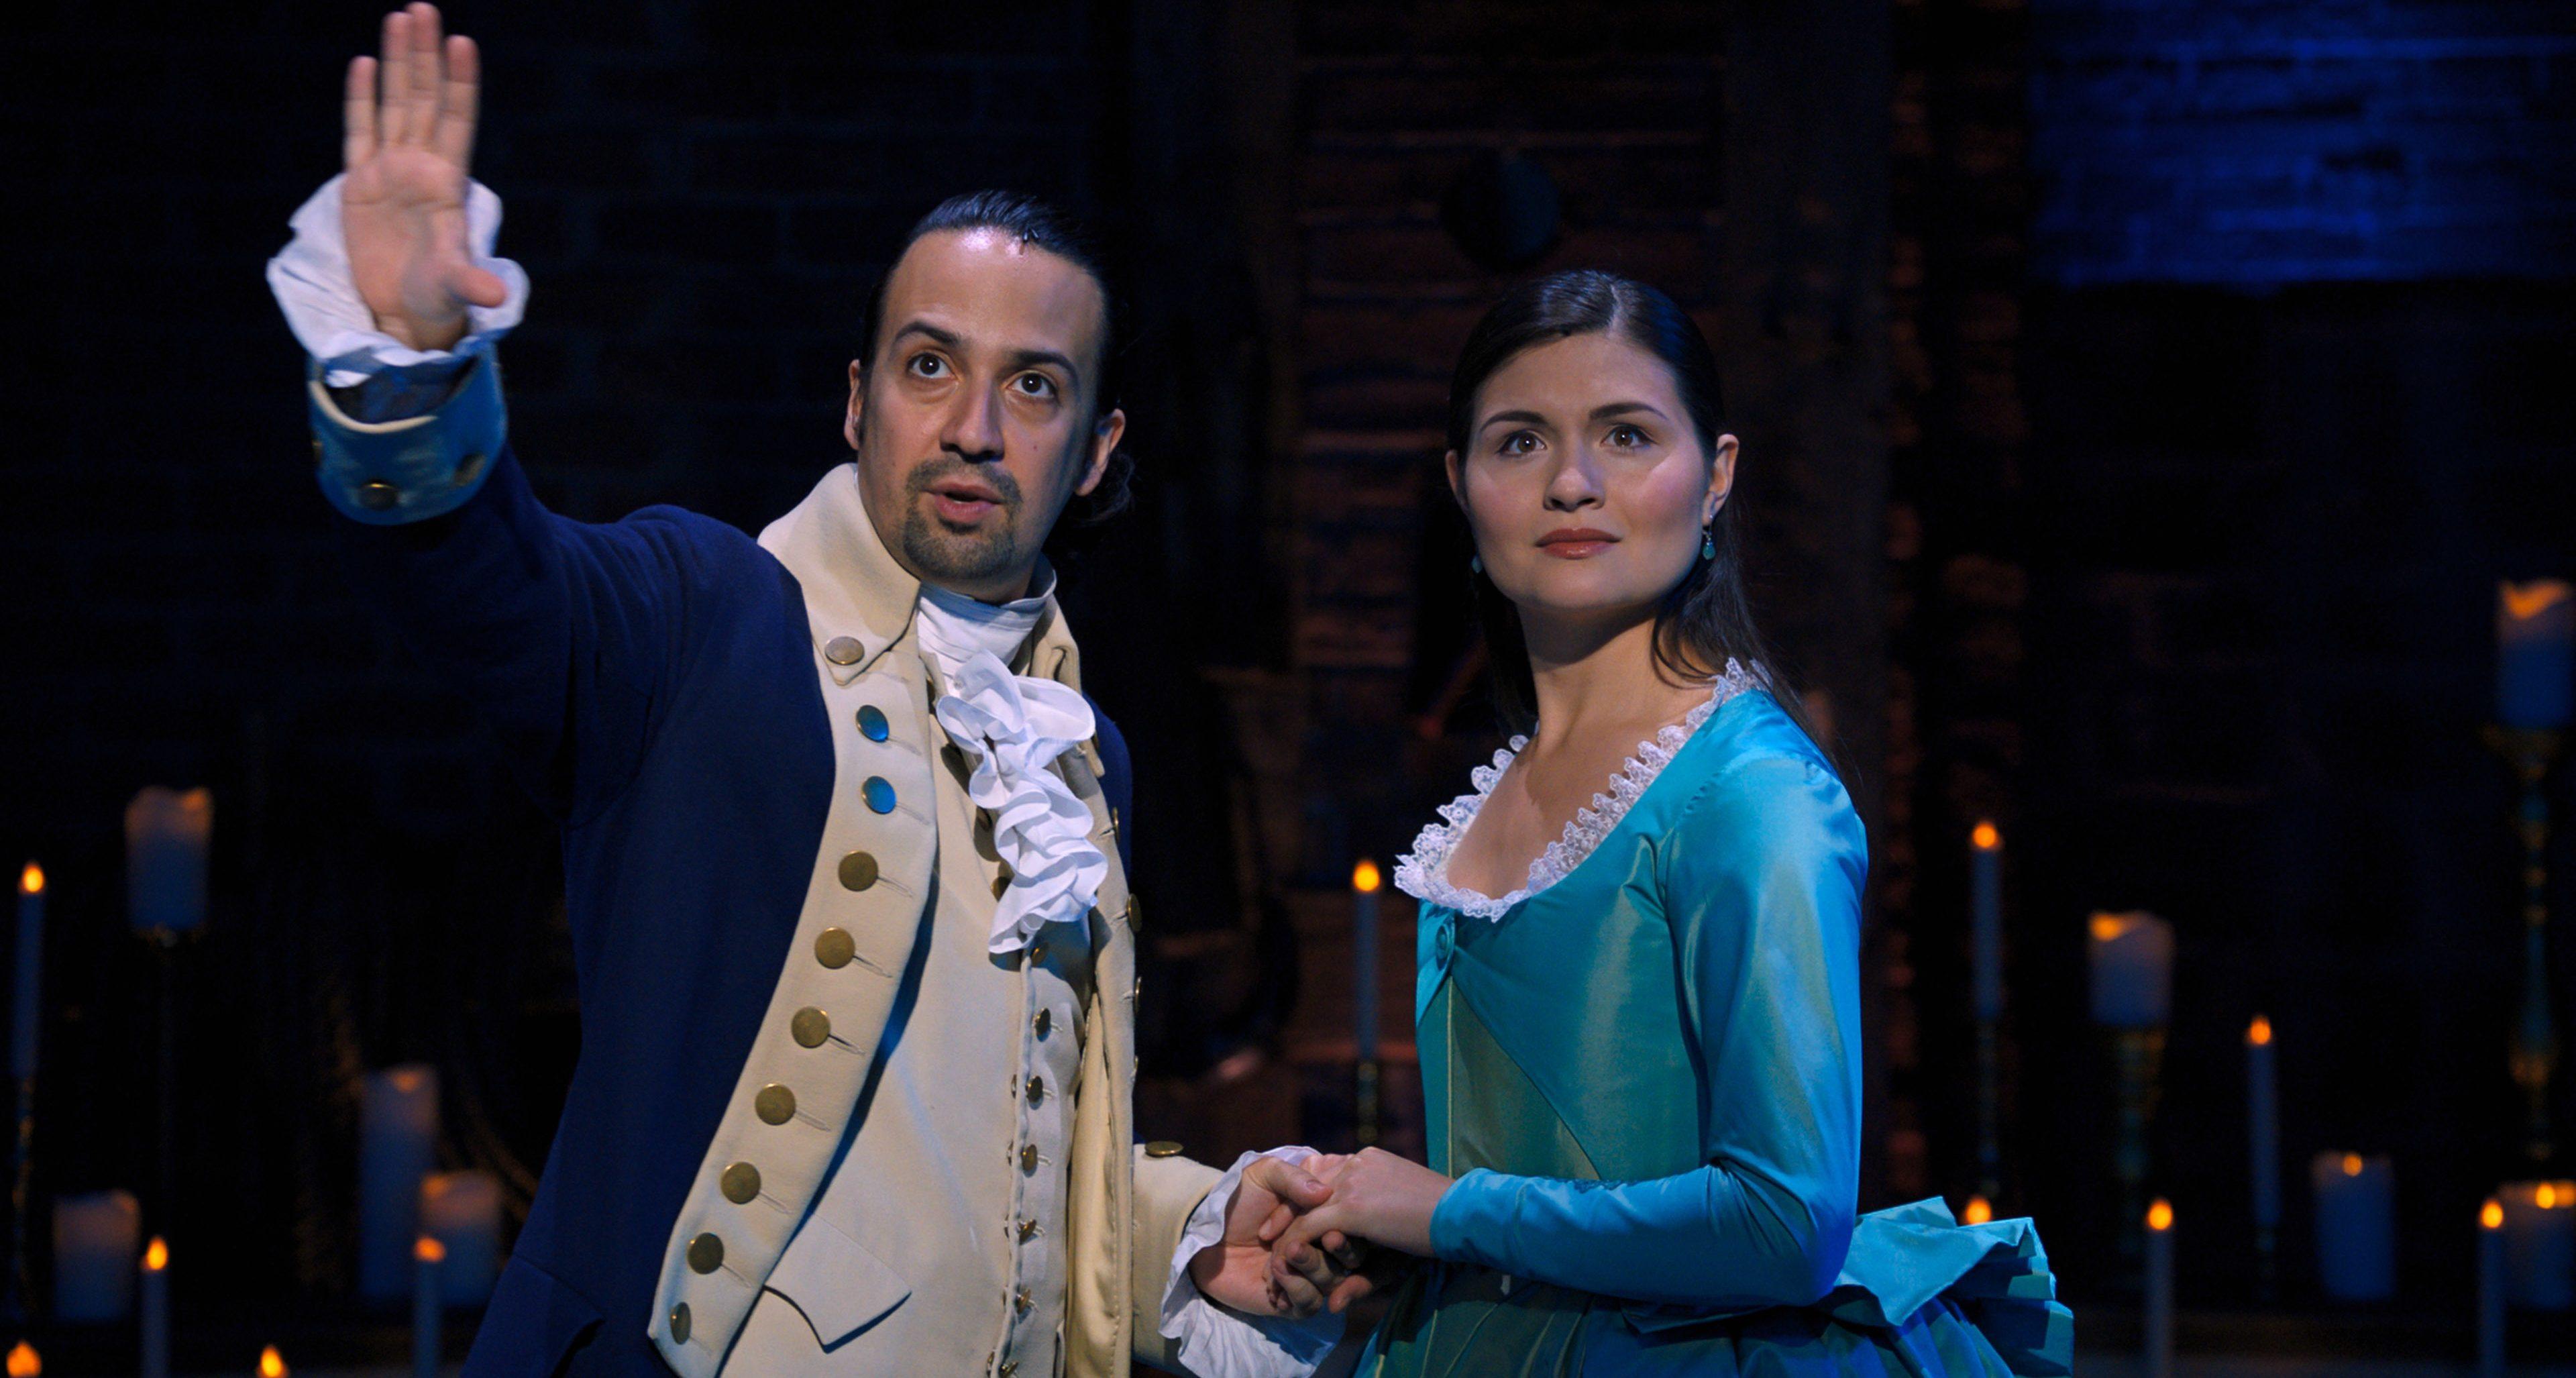 Rise Up! Disney+ Releases Trailer for 'Hamilton' Film